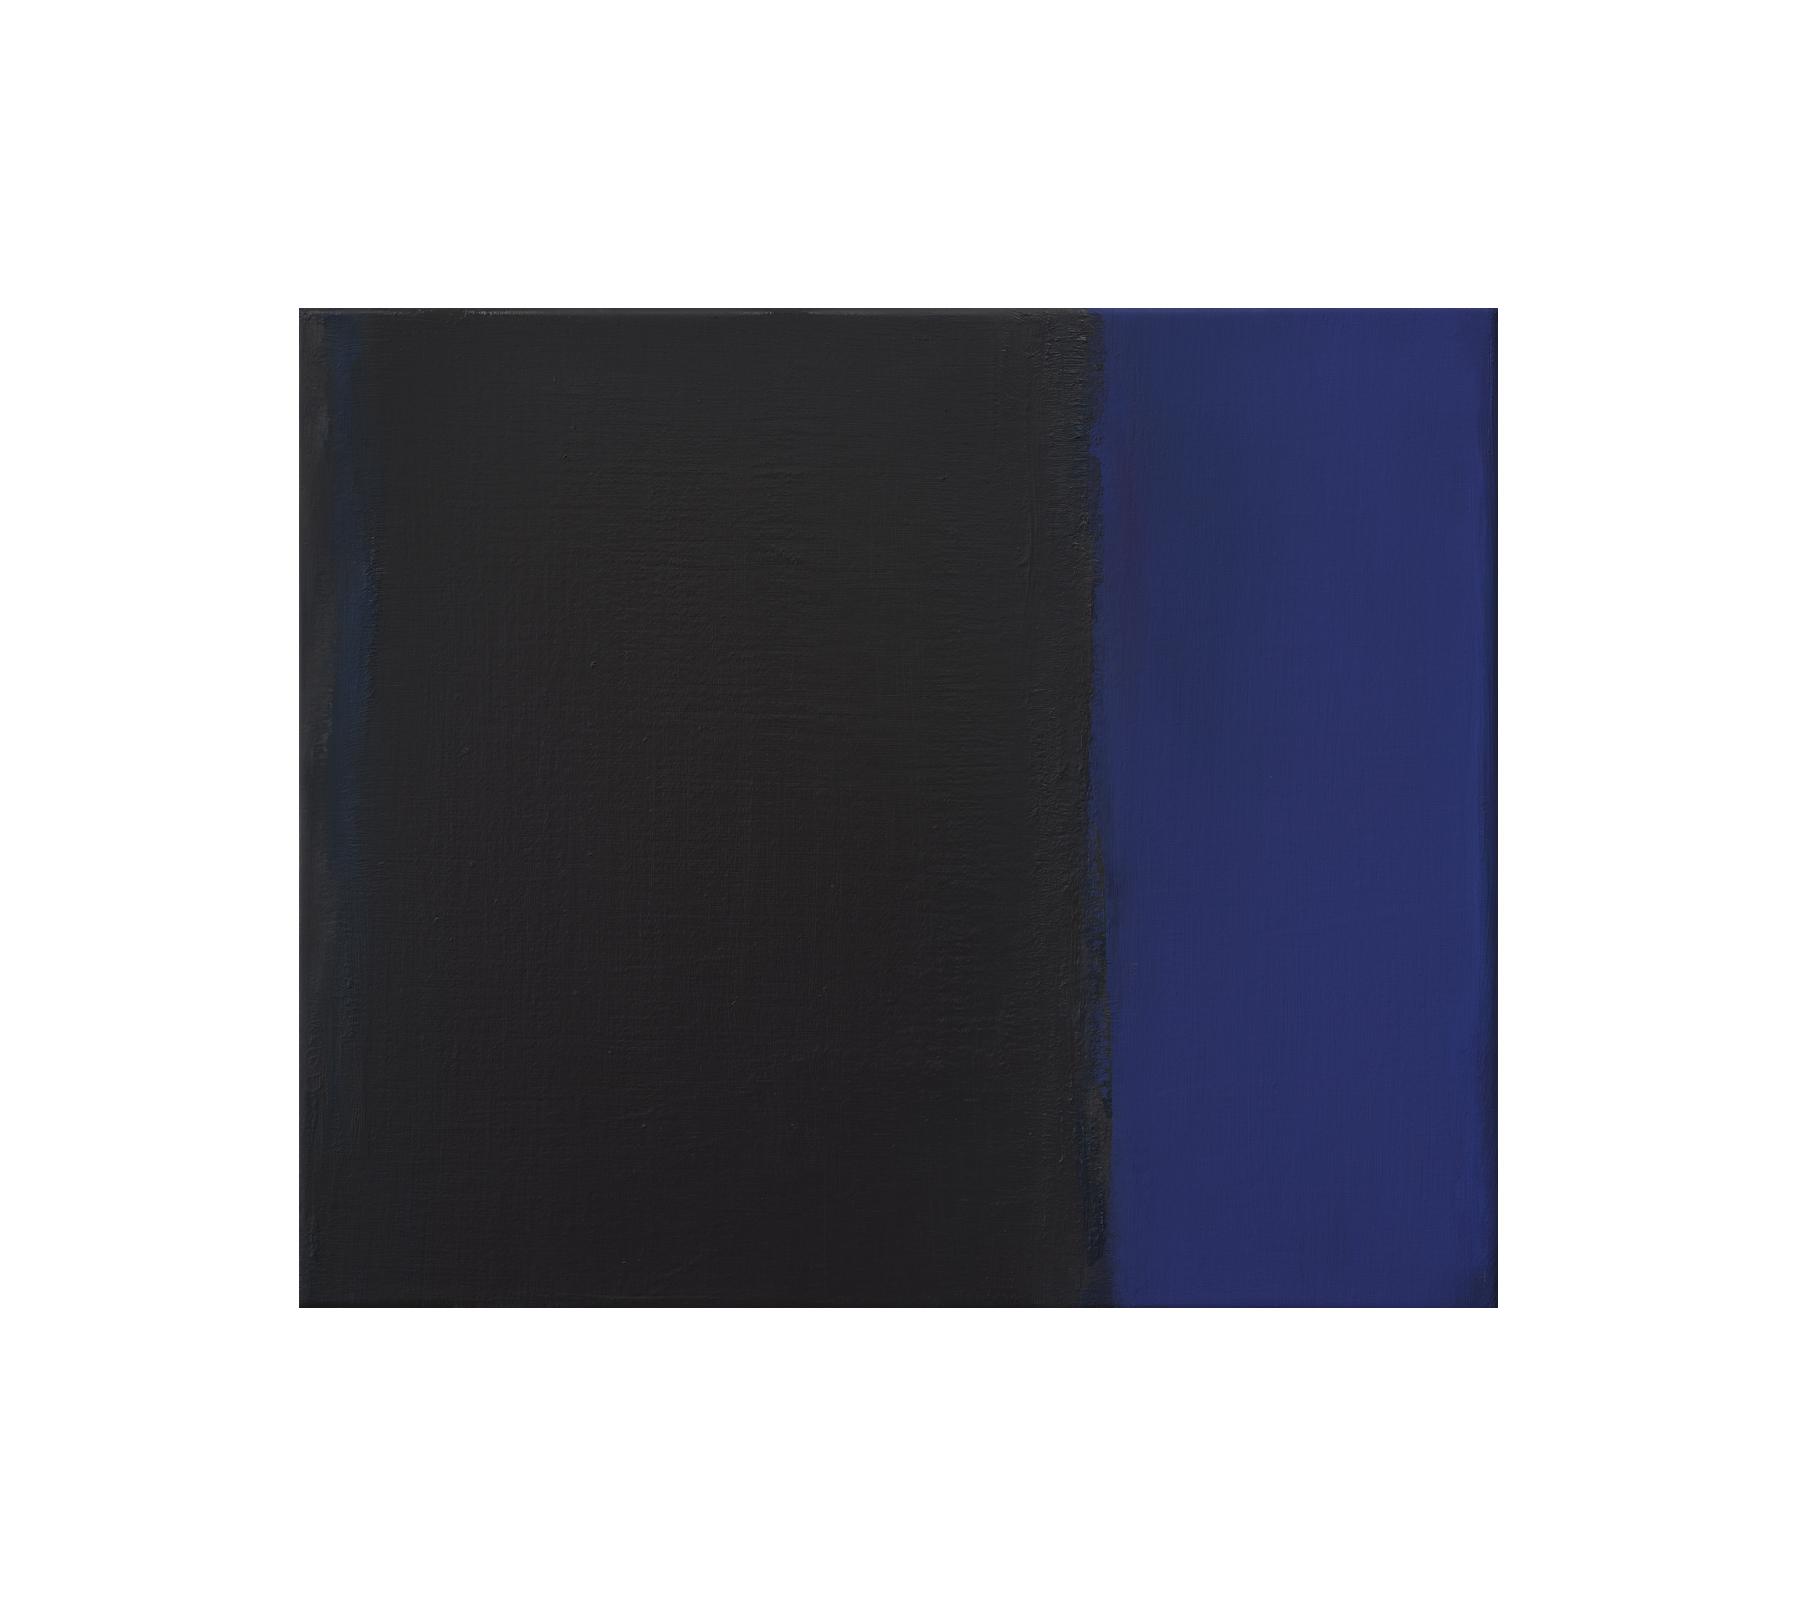 Untitled 2018 50x60cm